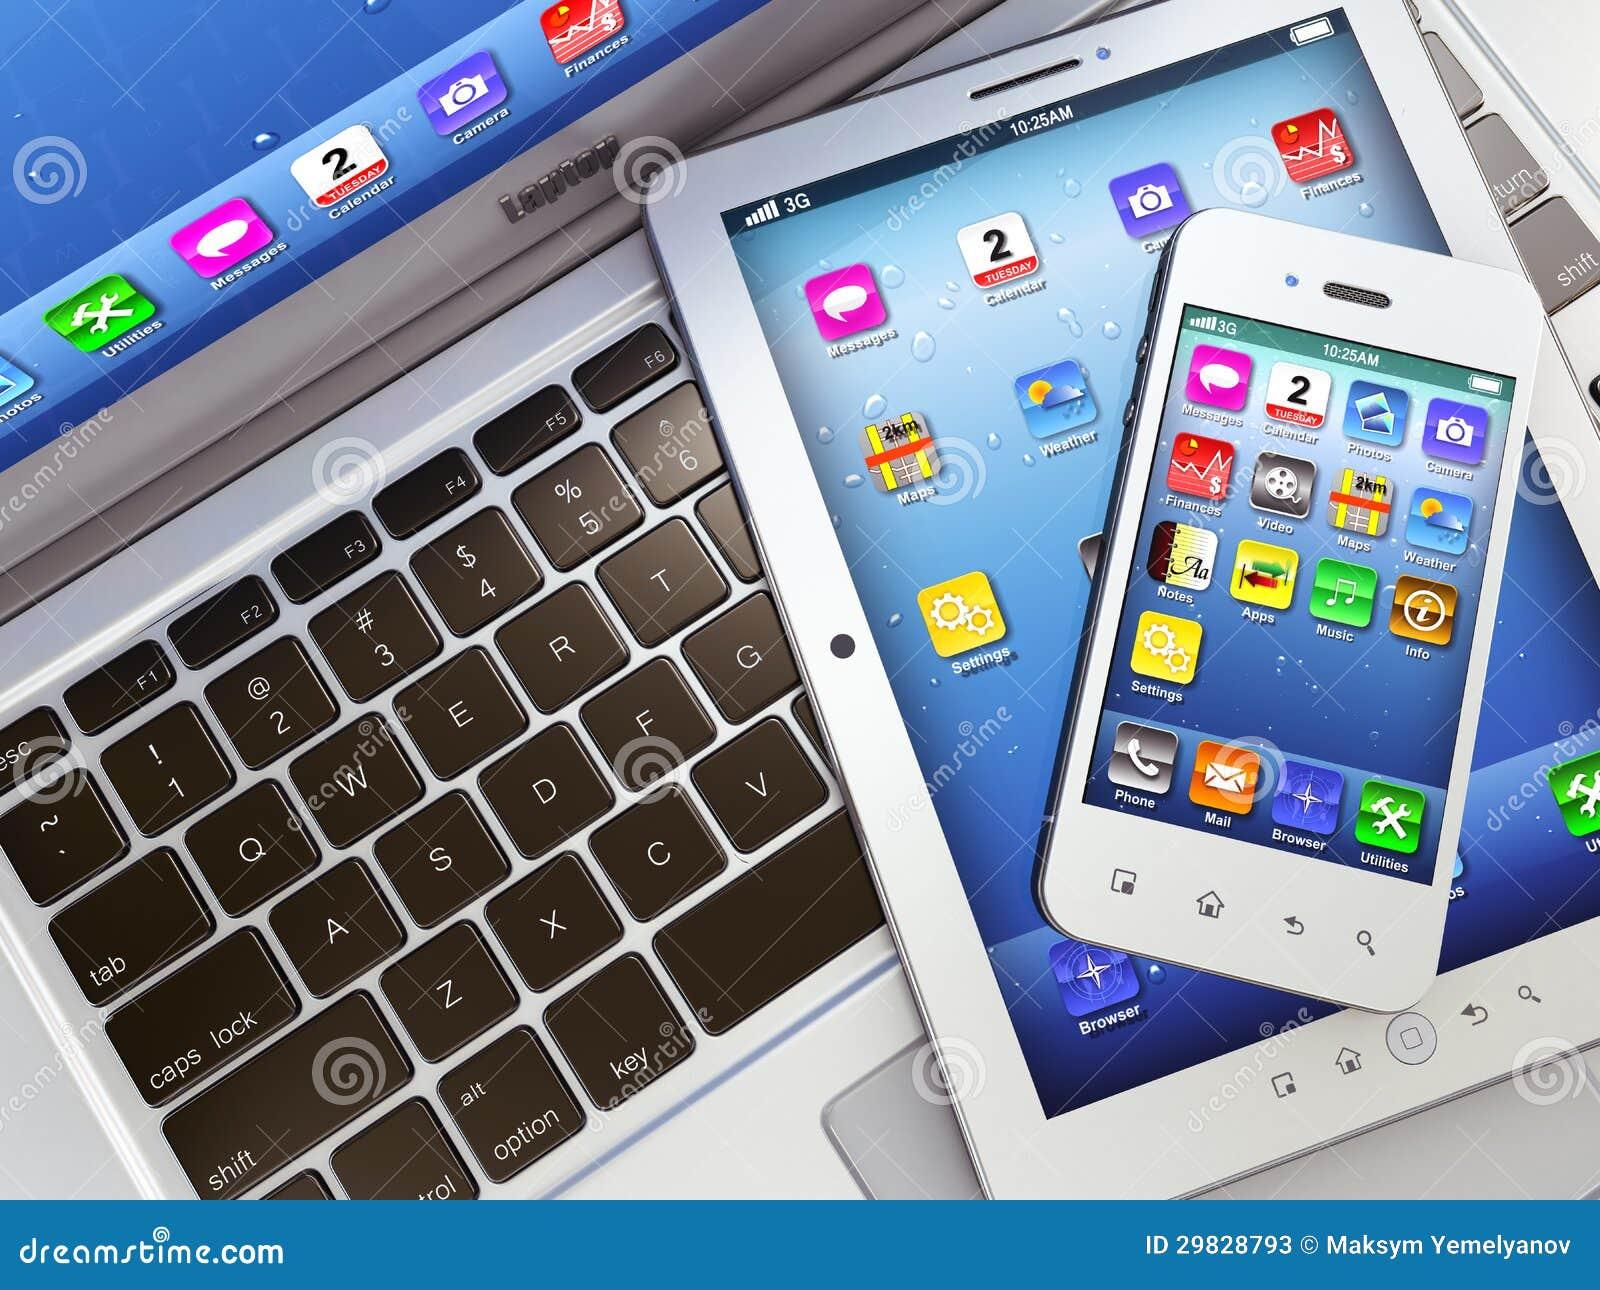 laptop mobile phone and digital tablet pc stock photos. Black Bedroom Furniture Sets. Home Design Ideas